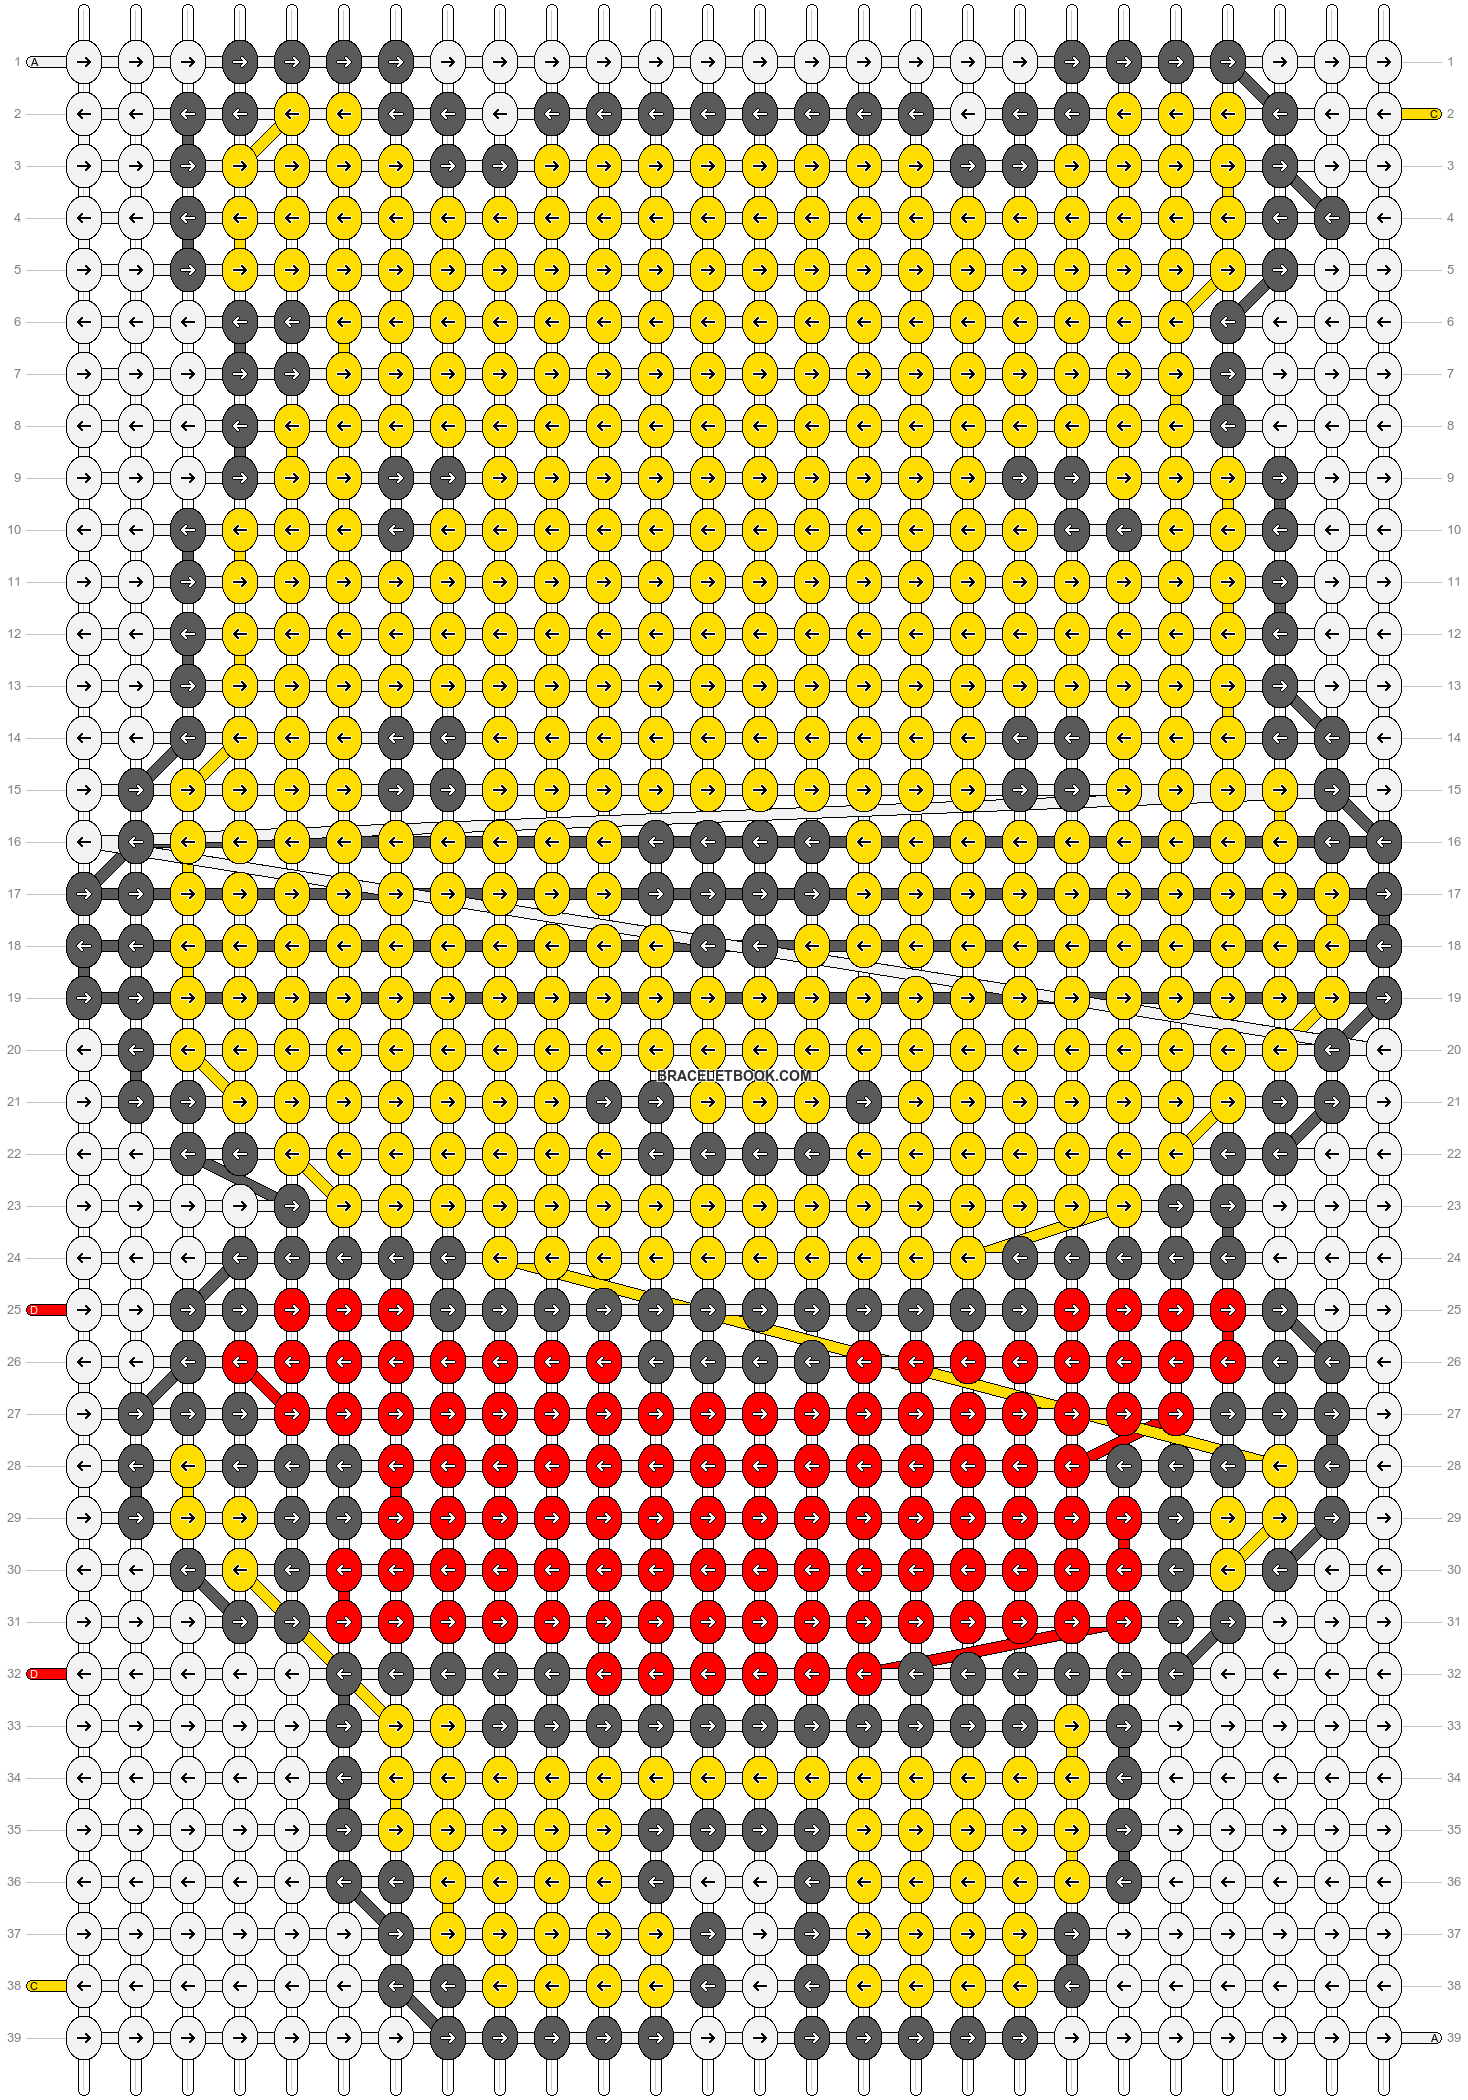 Alpha Pattern #7675 added by FTCN97